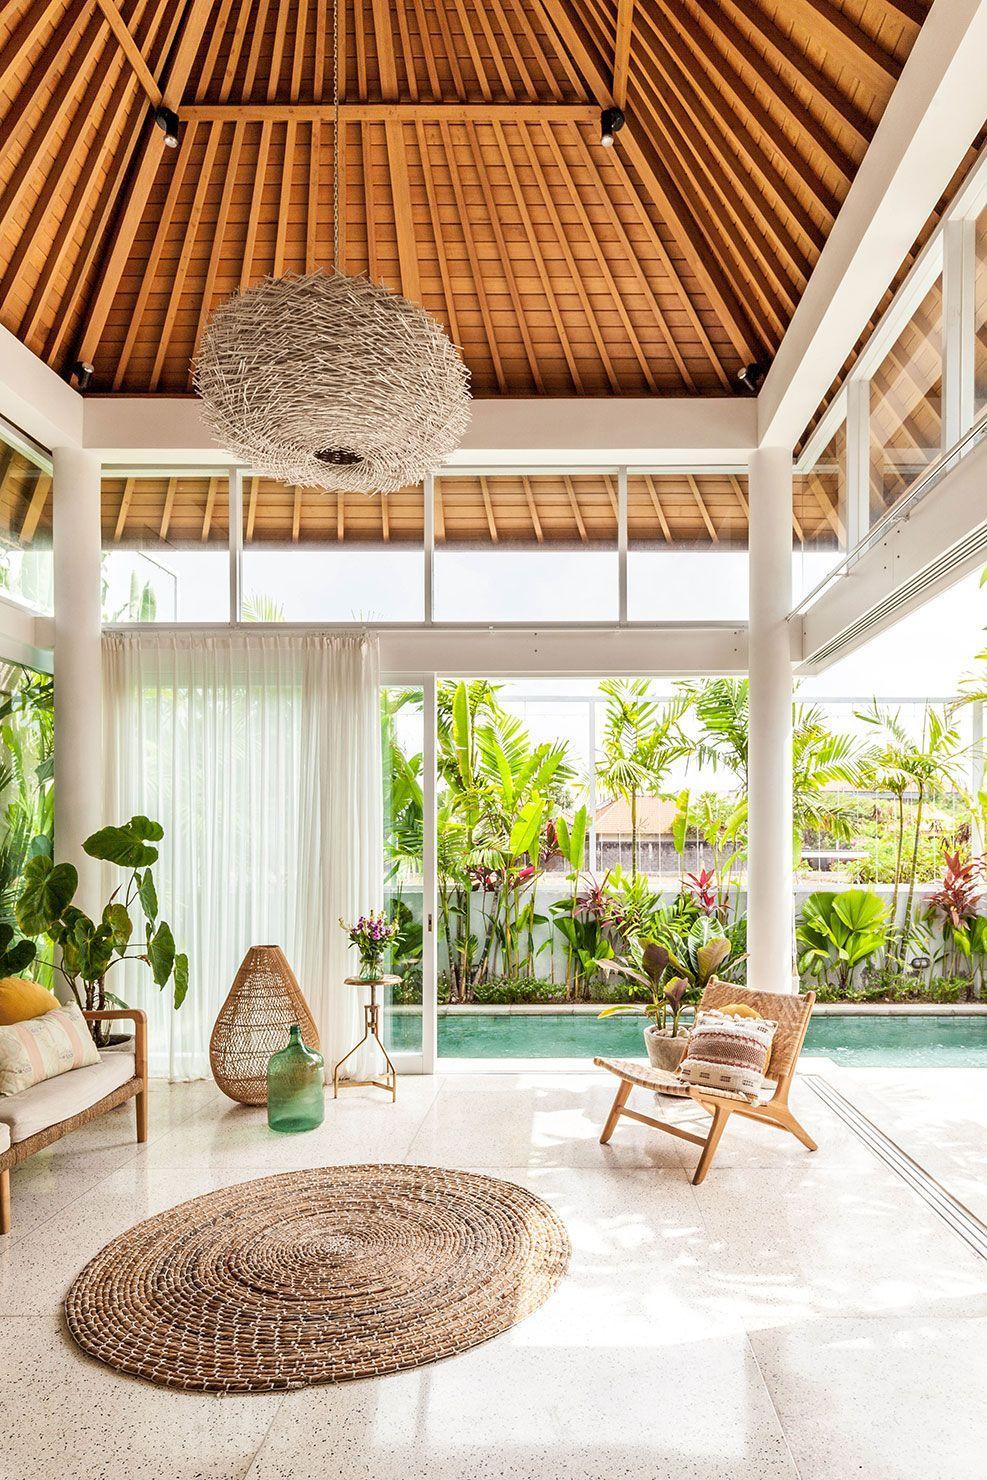 Home | Modern tropical house, Bali style home, Tropical ...